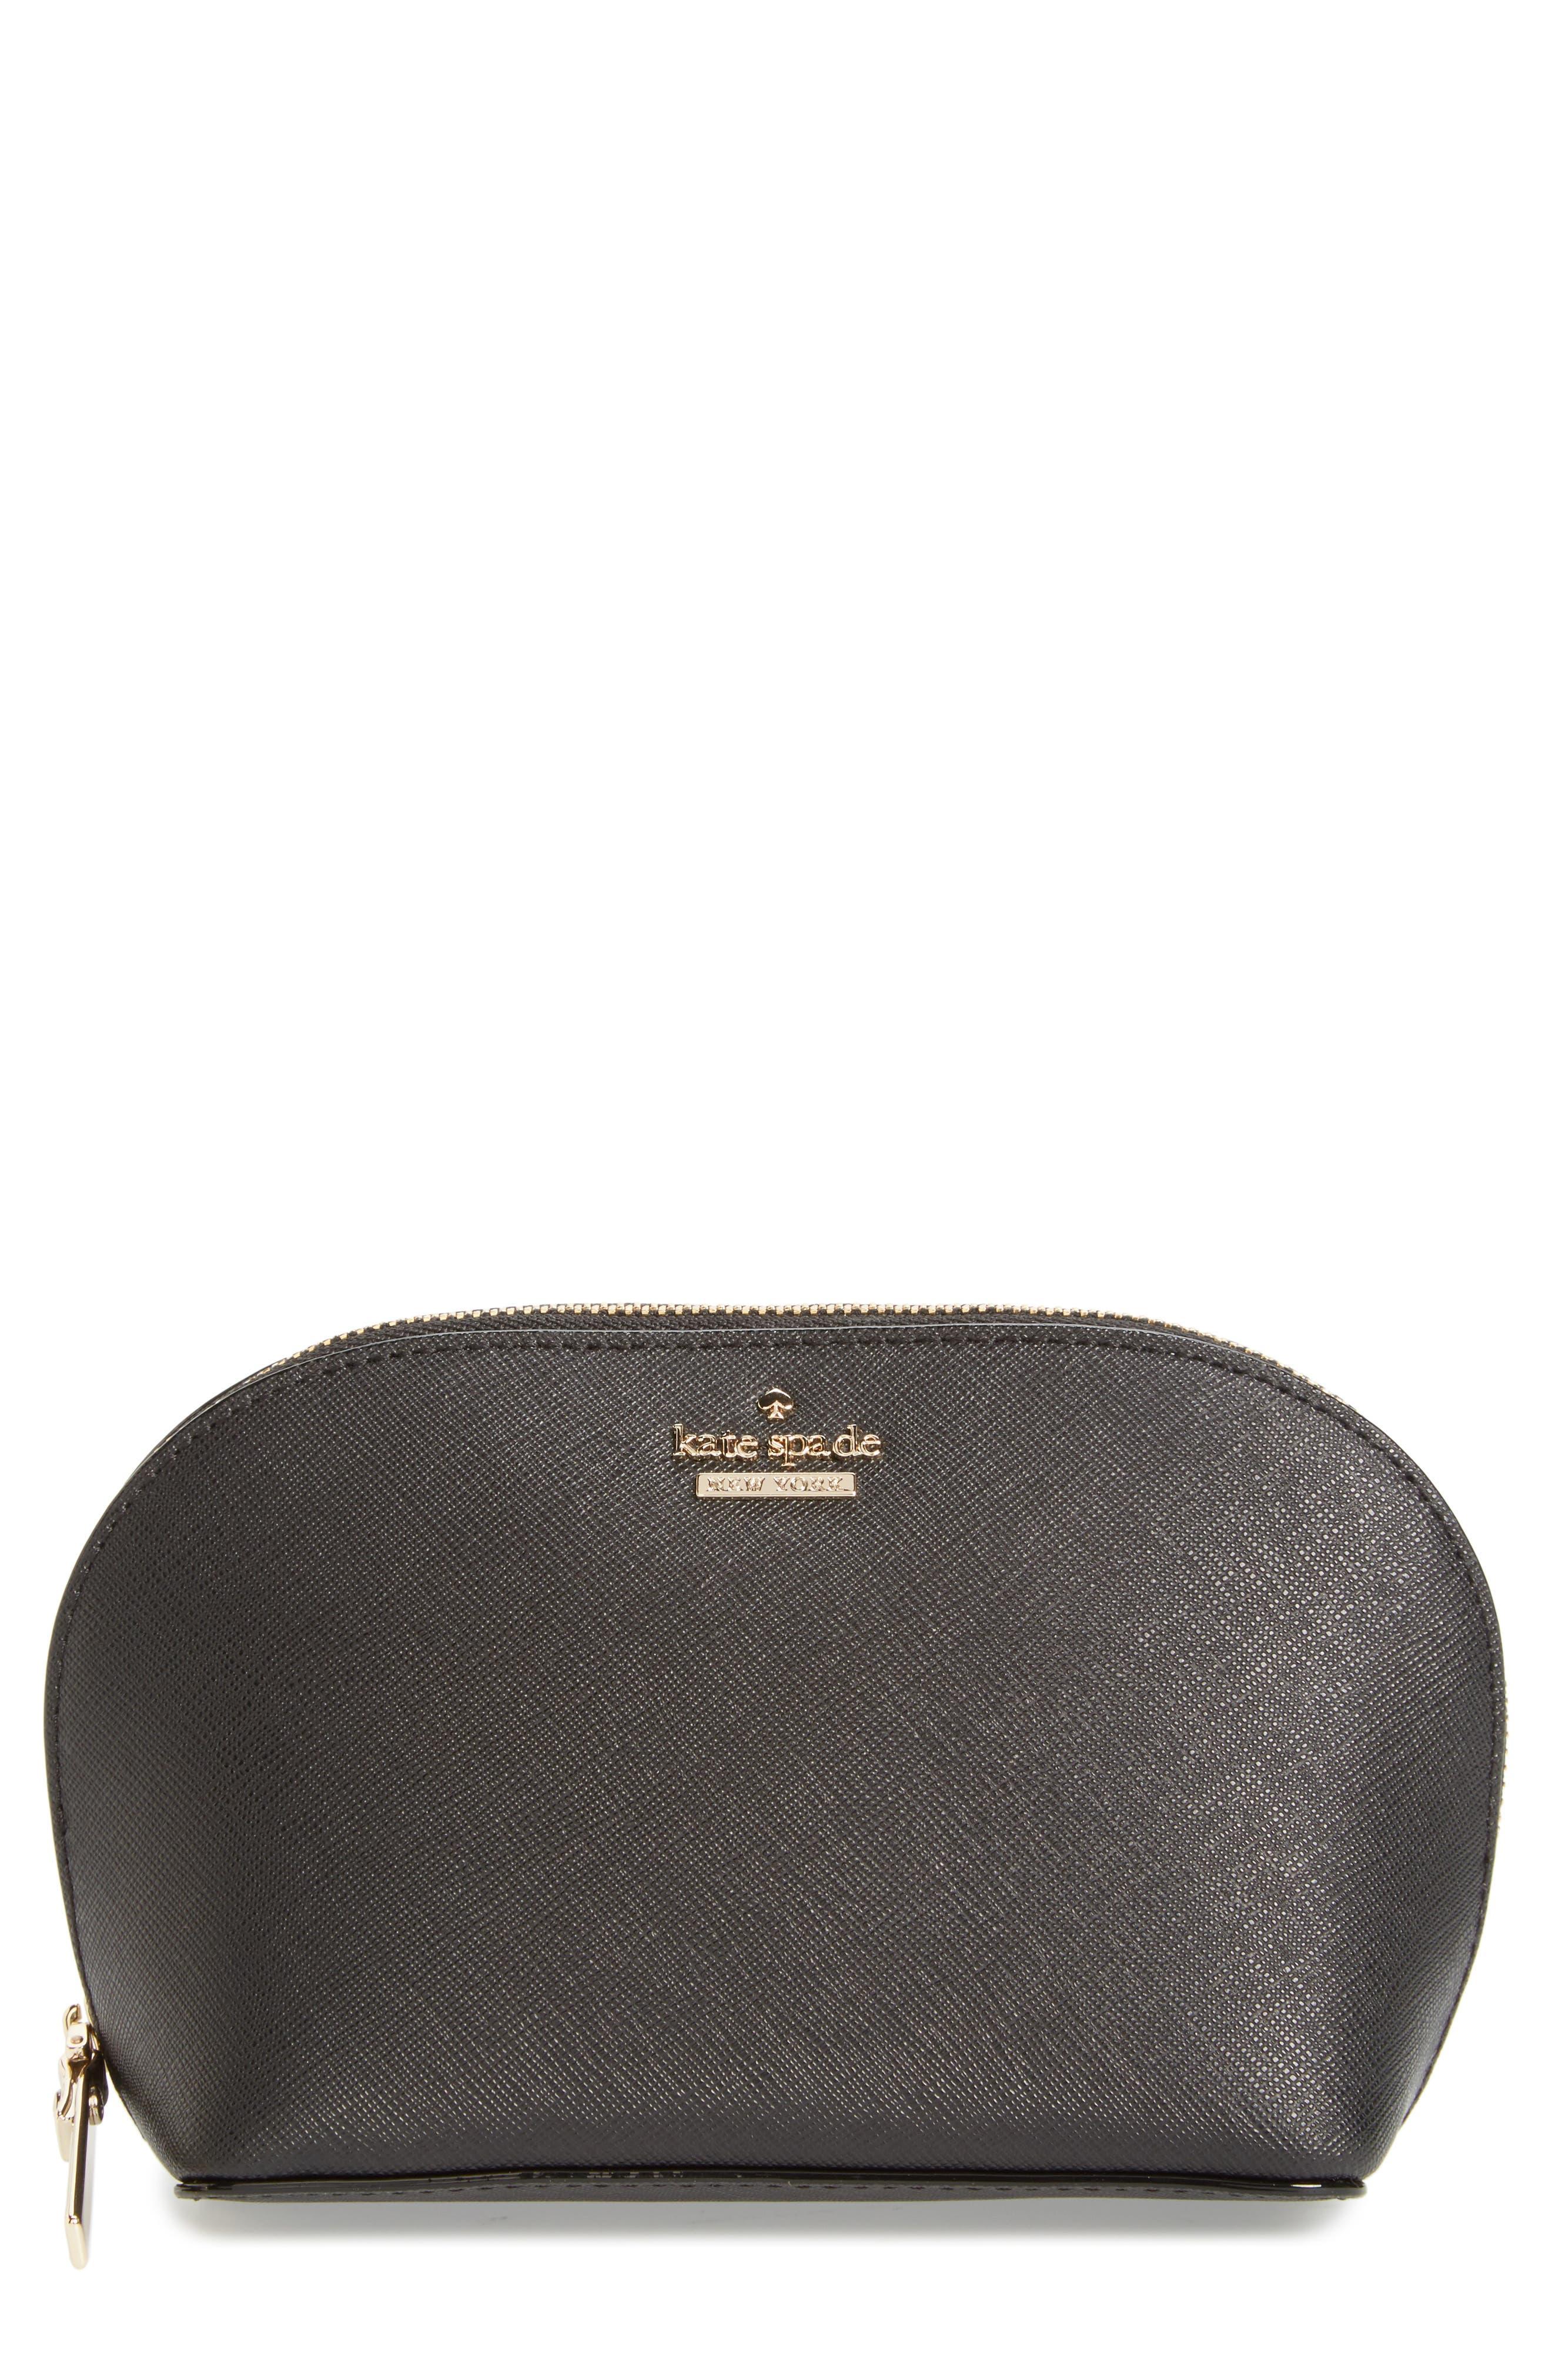 Cameron Street - Small Abalene Leather Cosmetics Case, Black